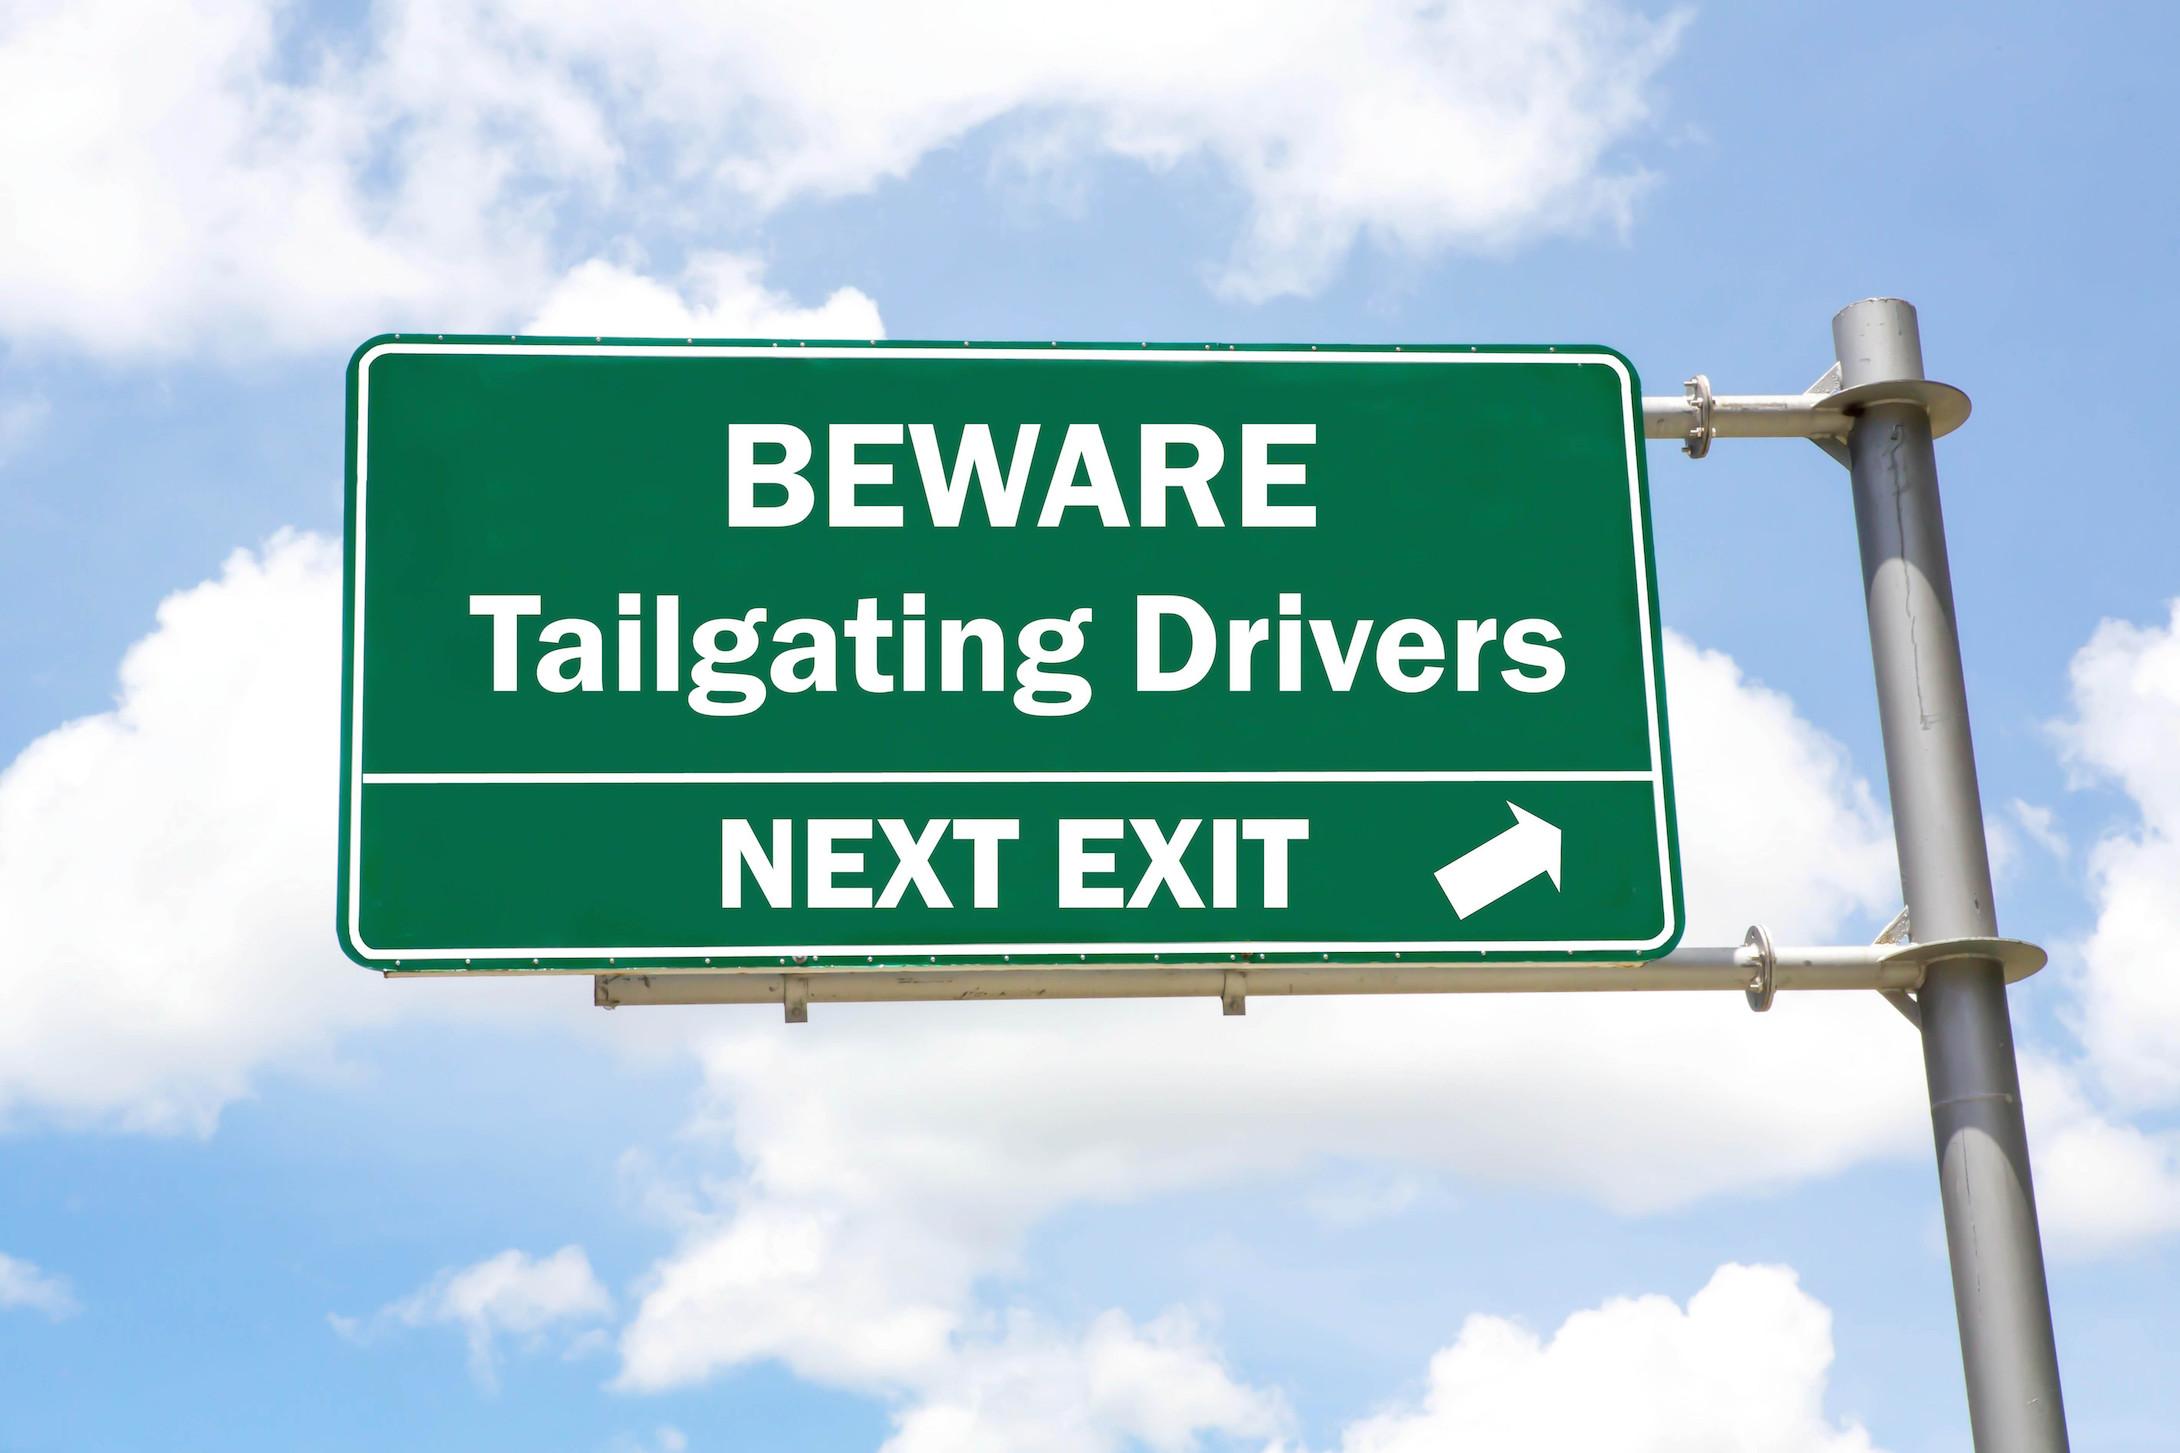 beware tailgating